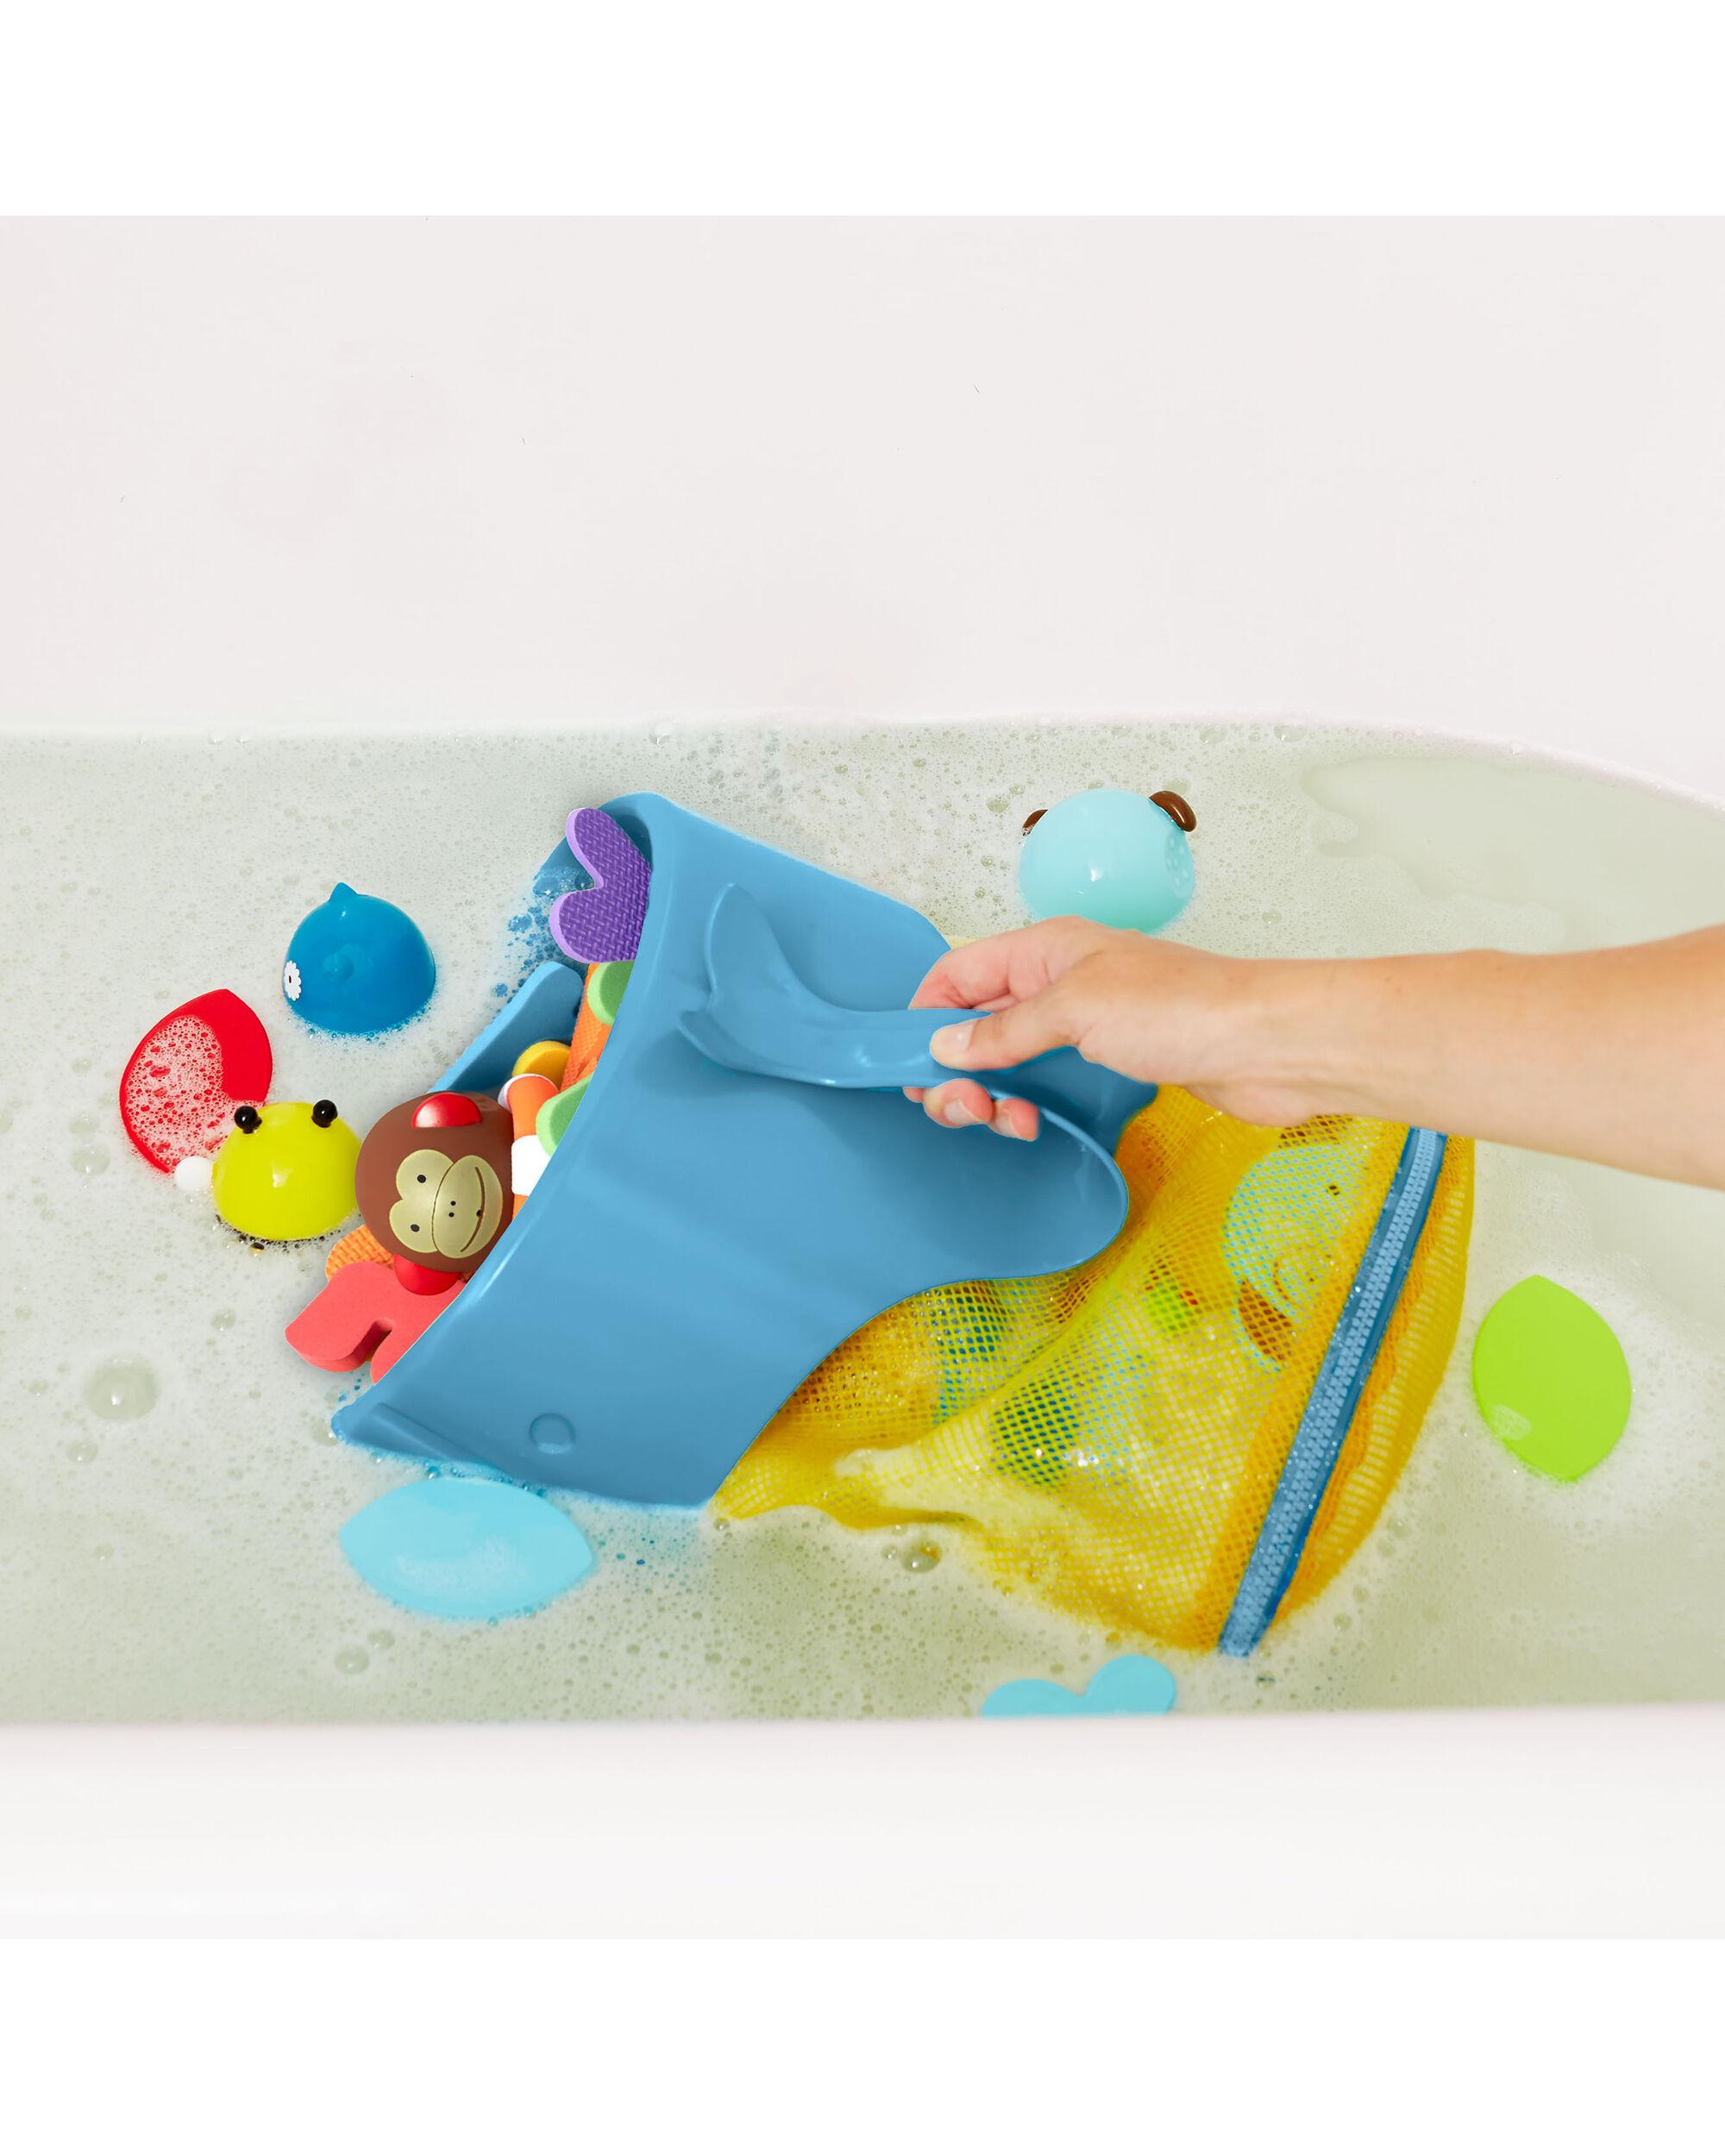 Moby Scoop & Splash Bath Toy Organizer   Skiphop.com